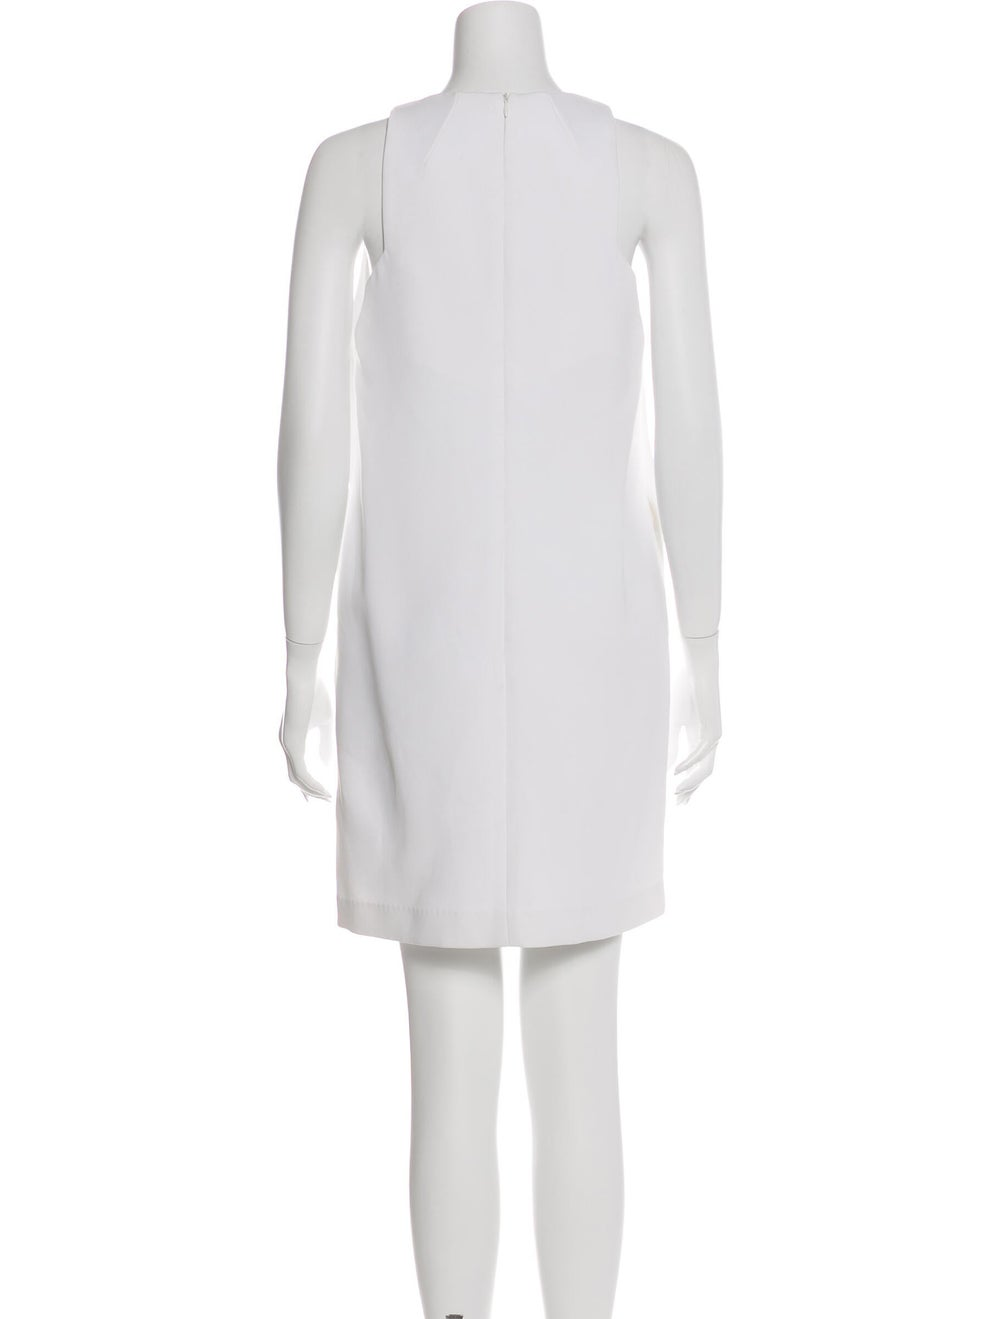 Ellery Plunge Neckline Mini Dress White - image 3